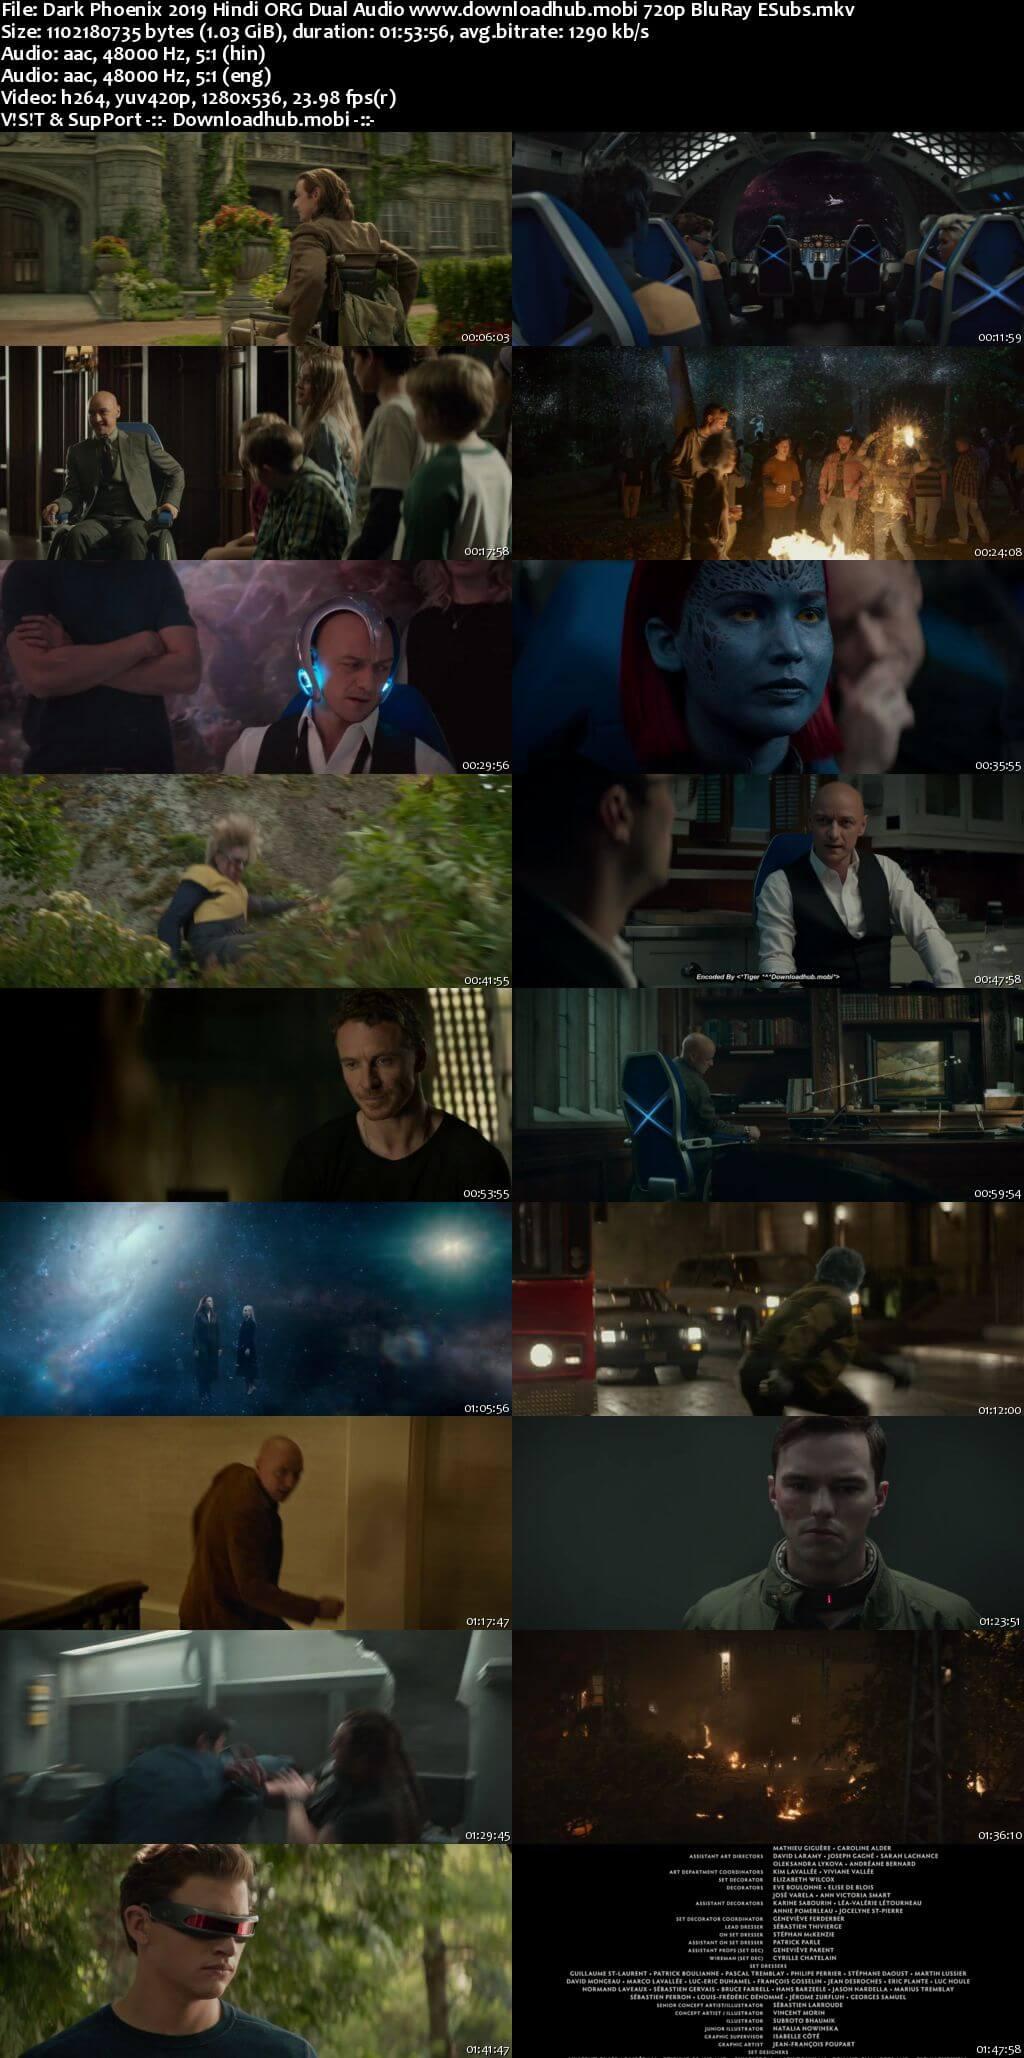 Dark Phoenix 2019 Hindi ORG Dual Audio 720p BluRay ESubs